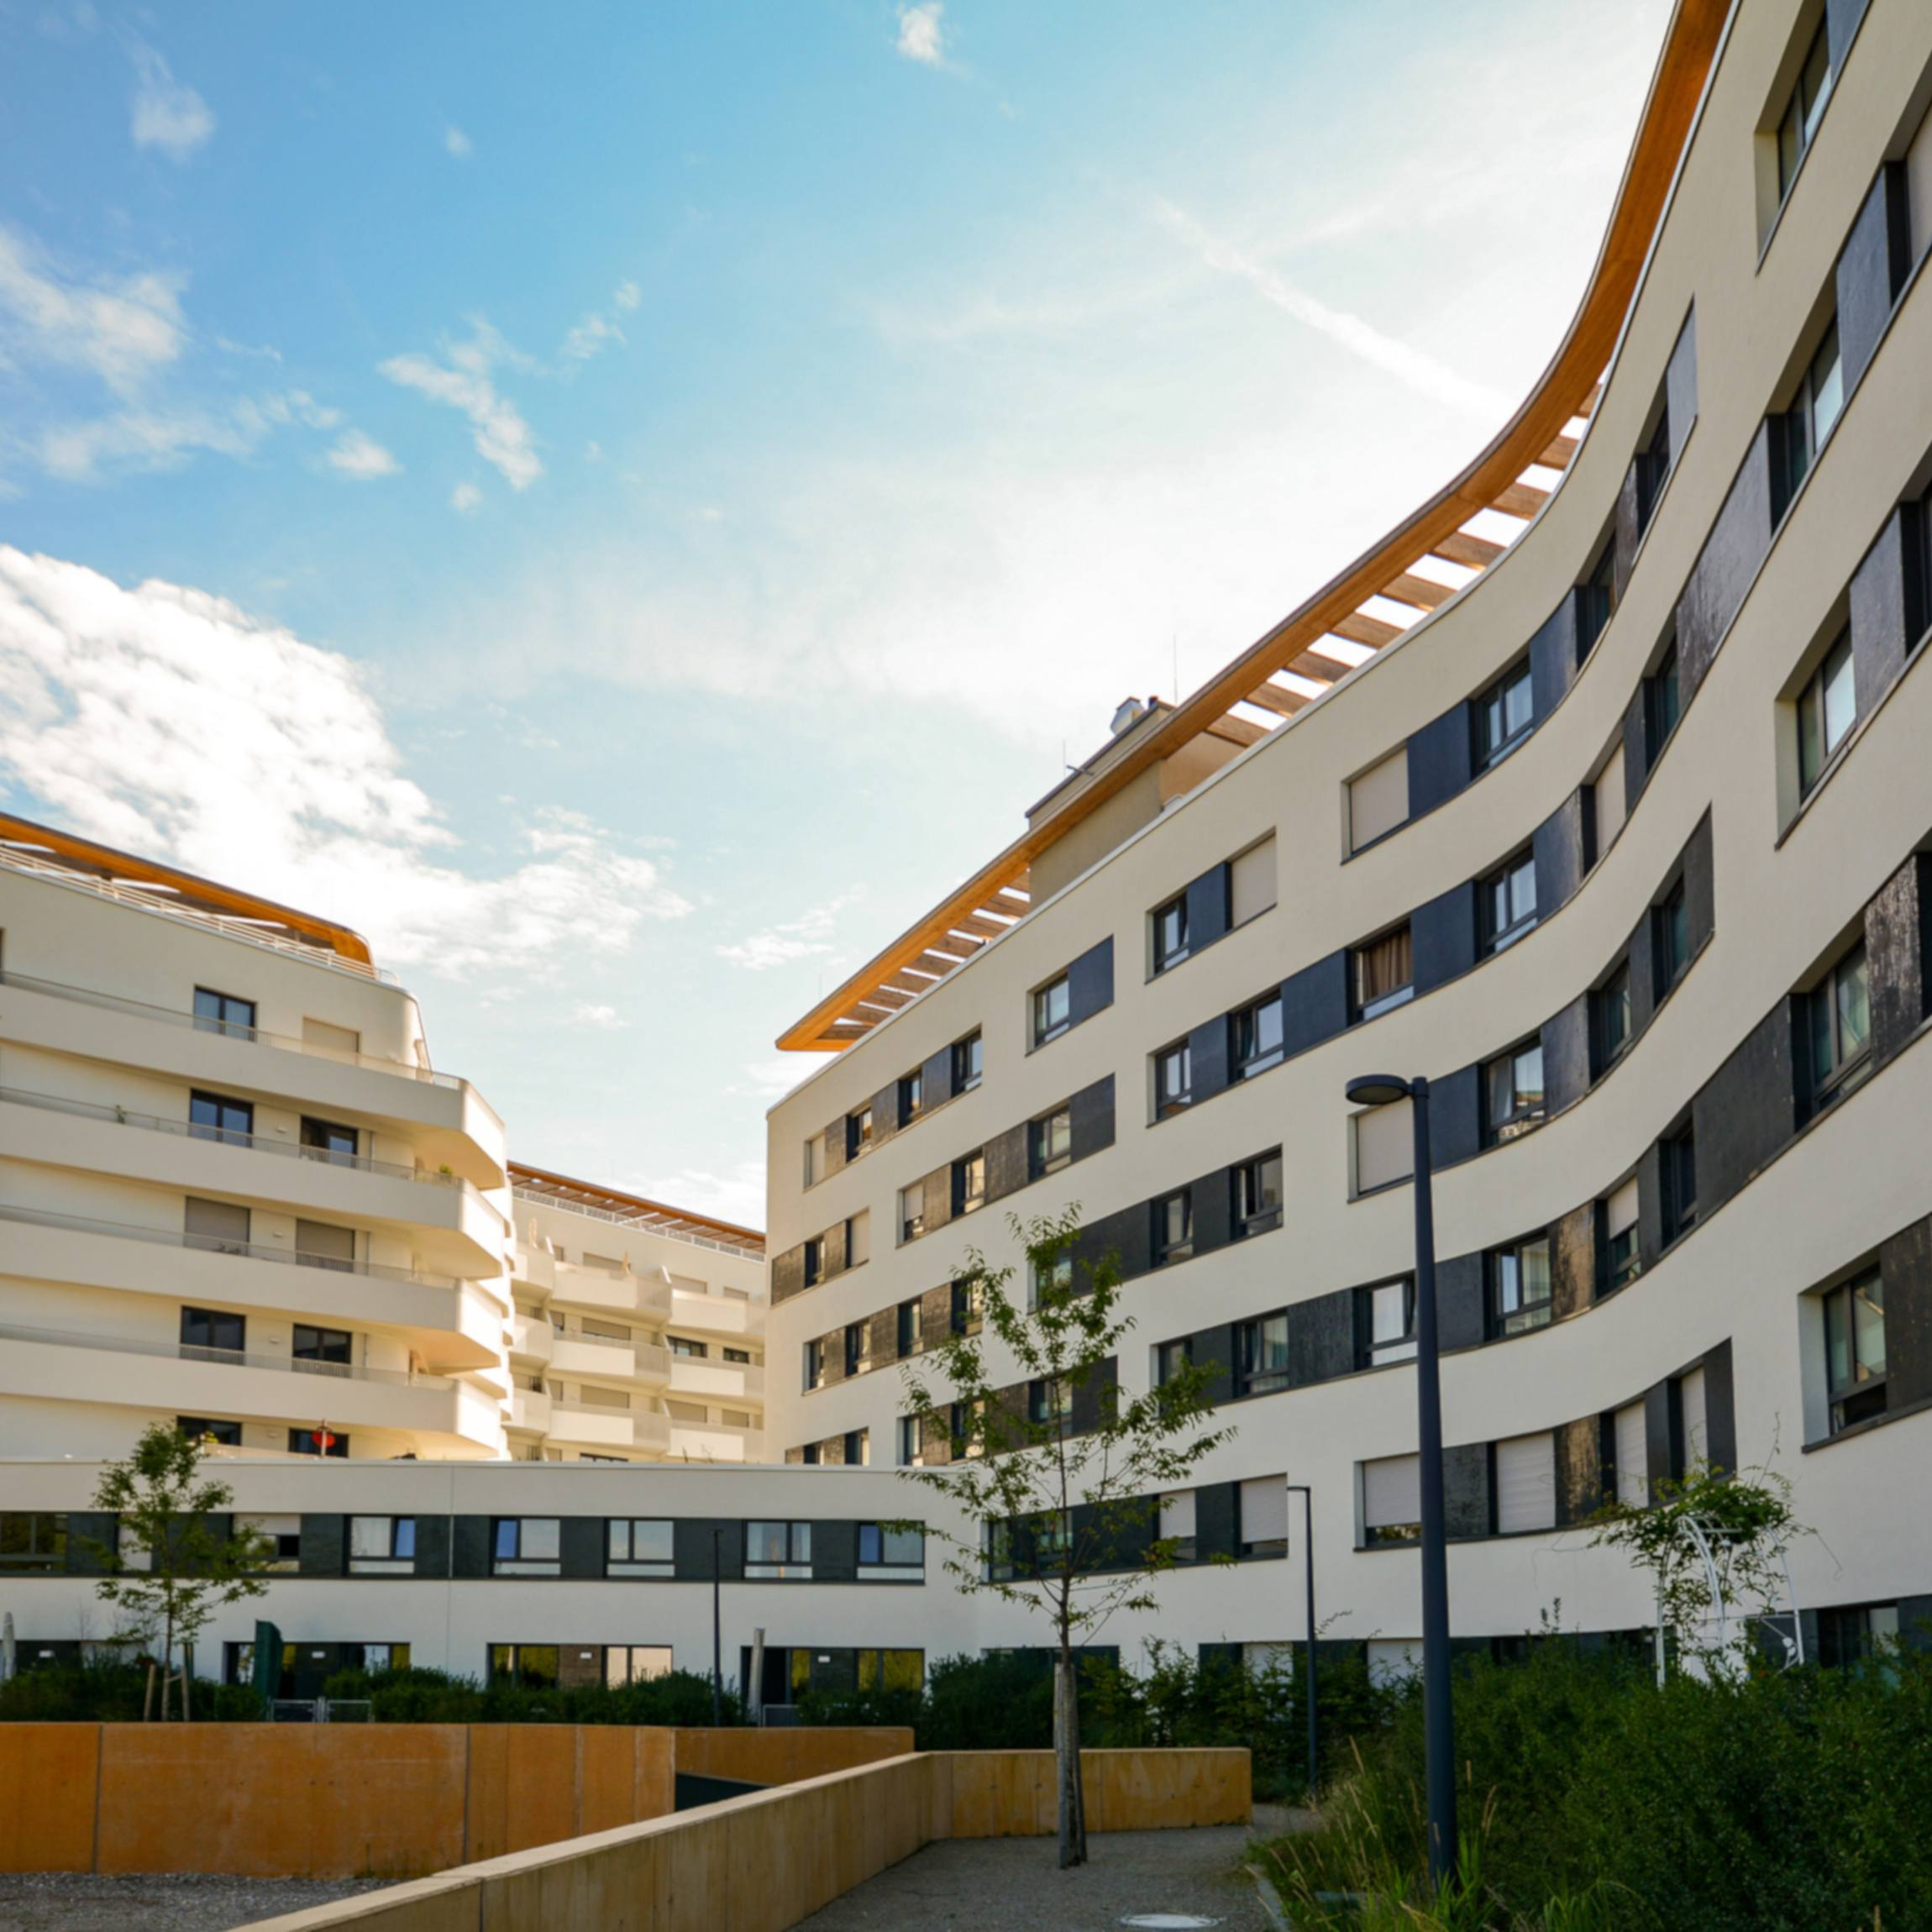 acheter  bien immobilier en sci familiale